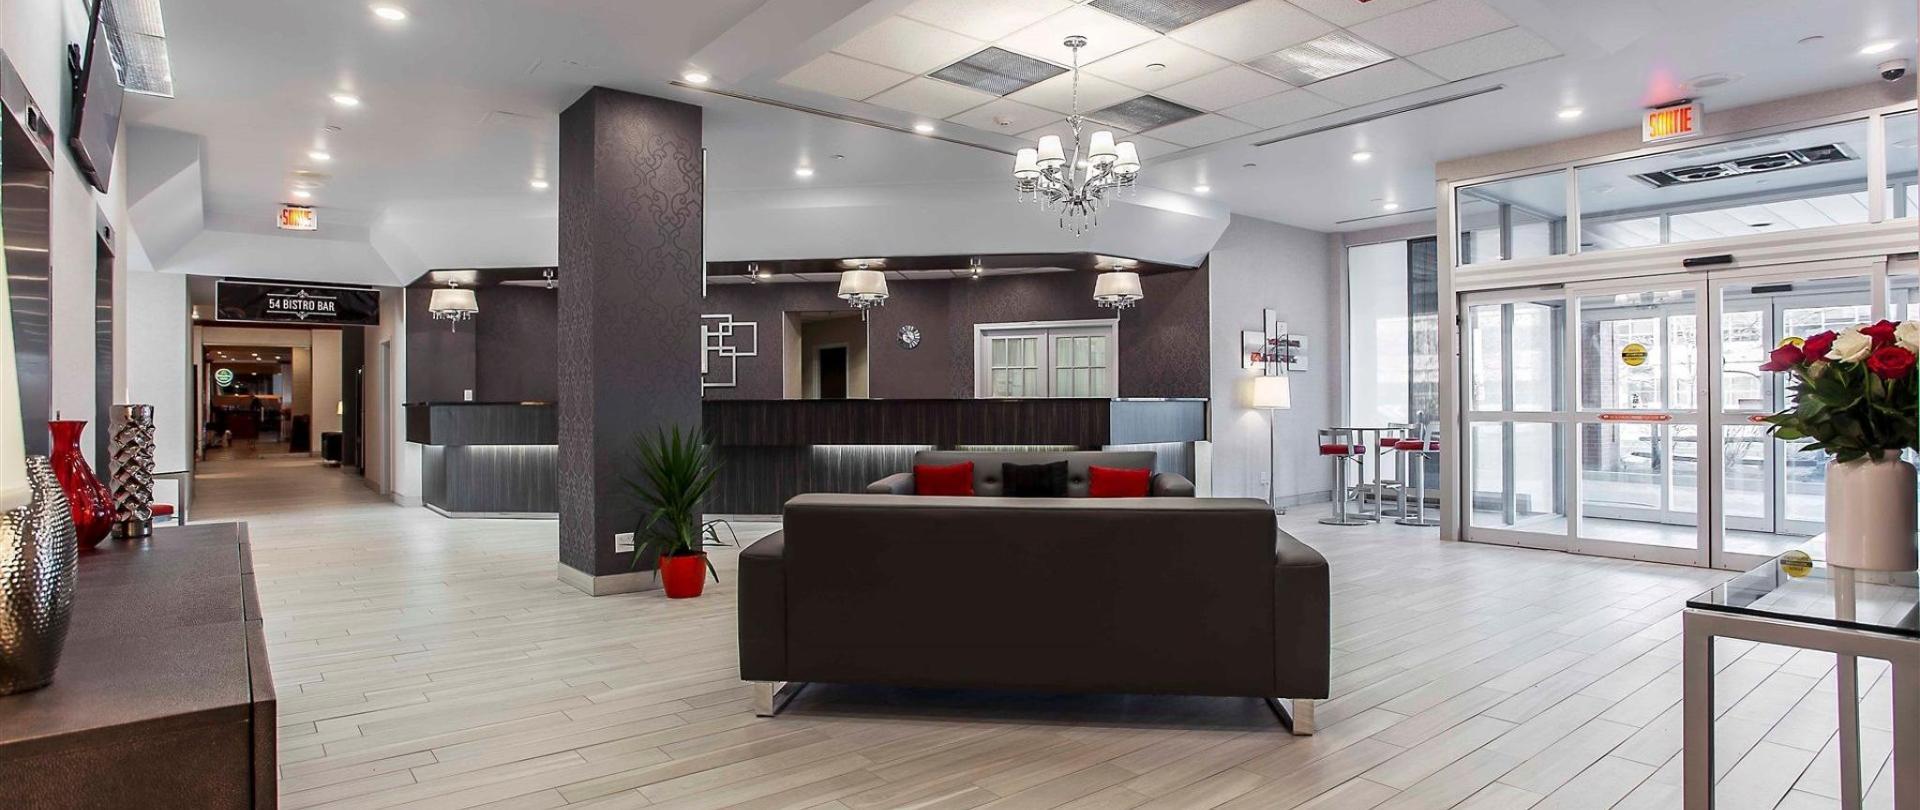 lobby-front-desk-area-1.jpg